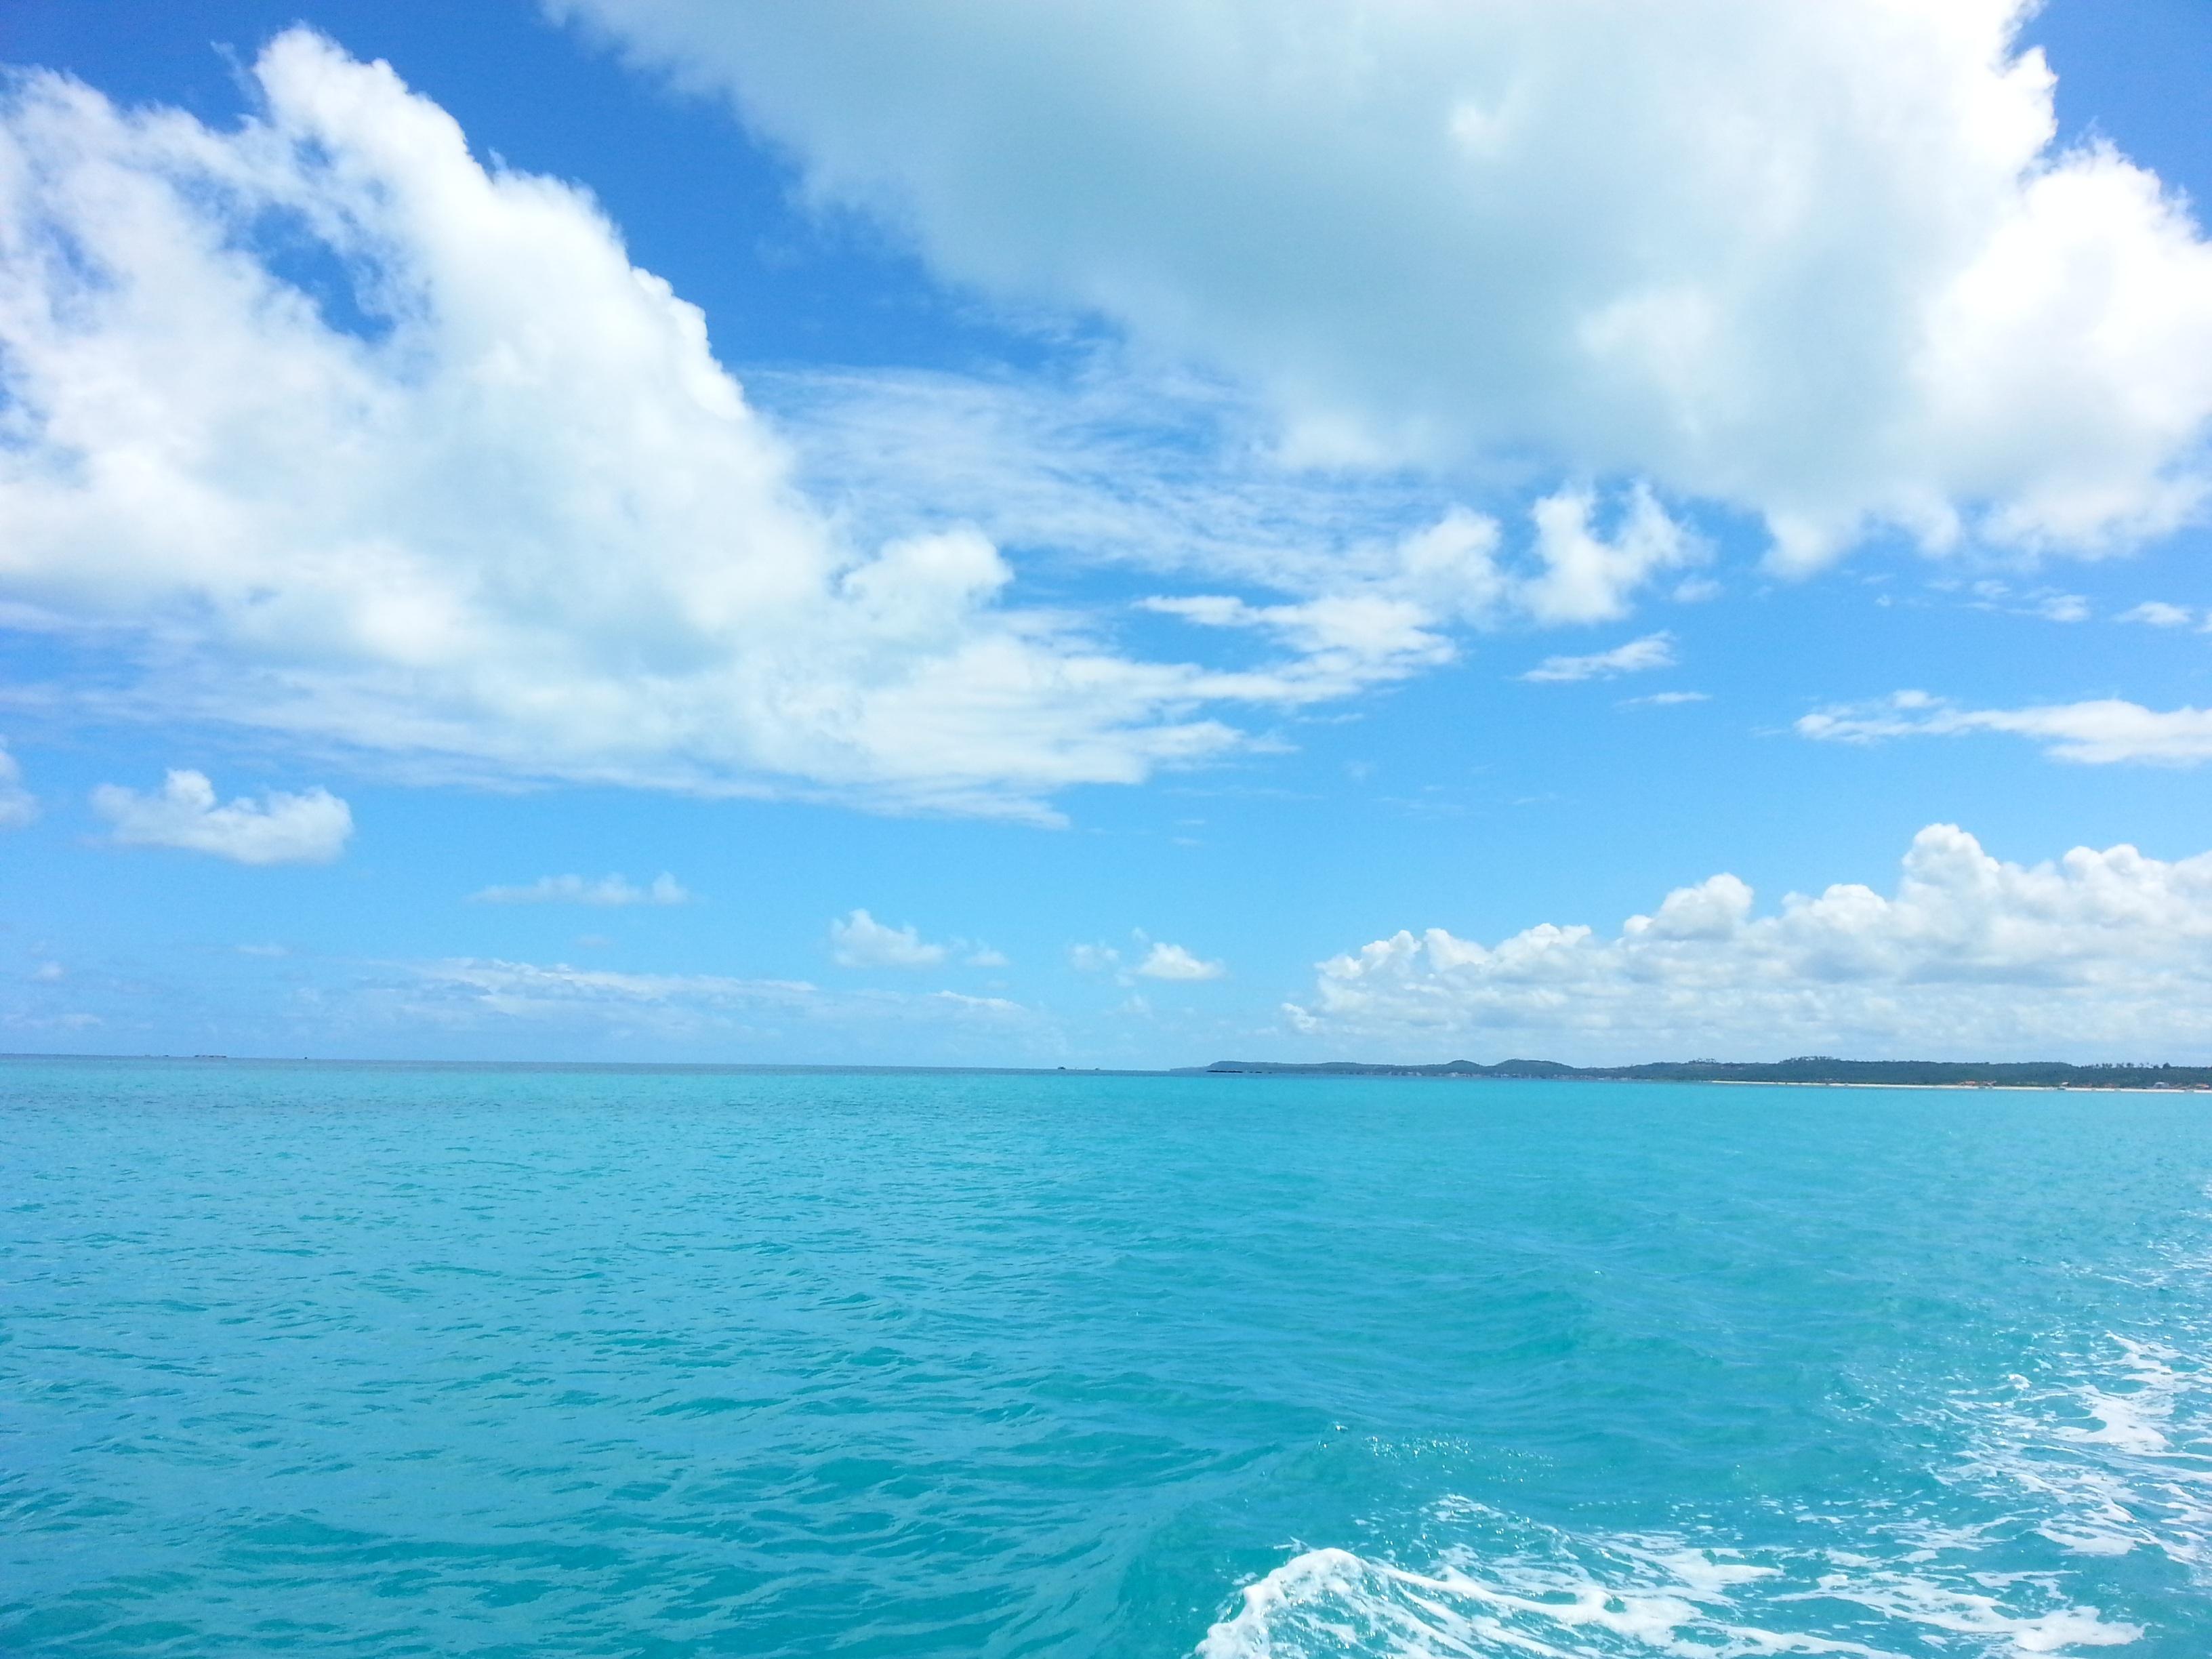 Gambar Pantai Pemandangan Laut Pasir Lautan Horison Awan